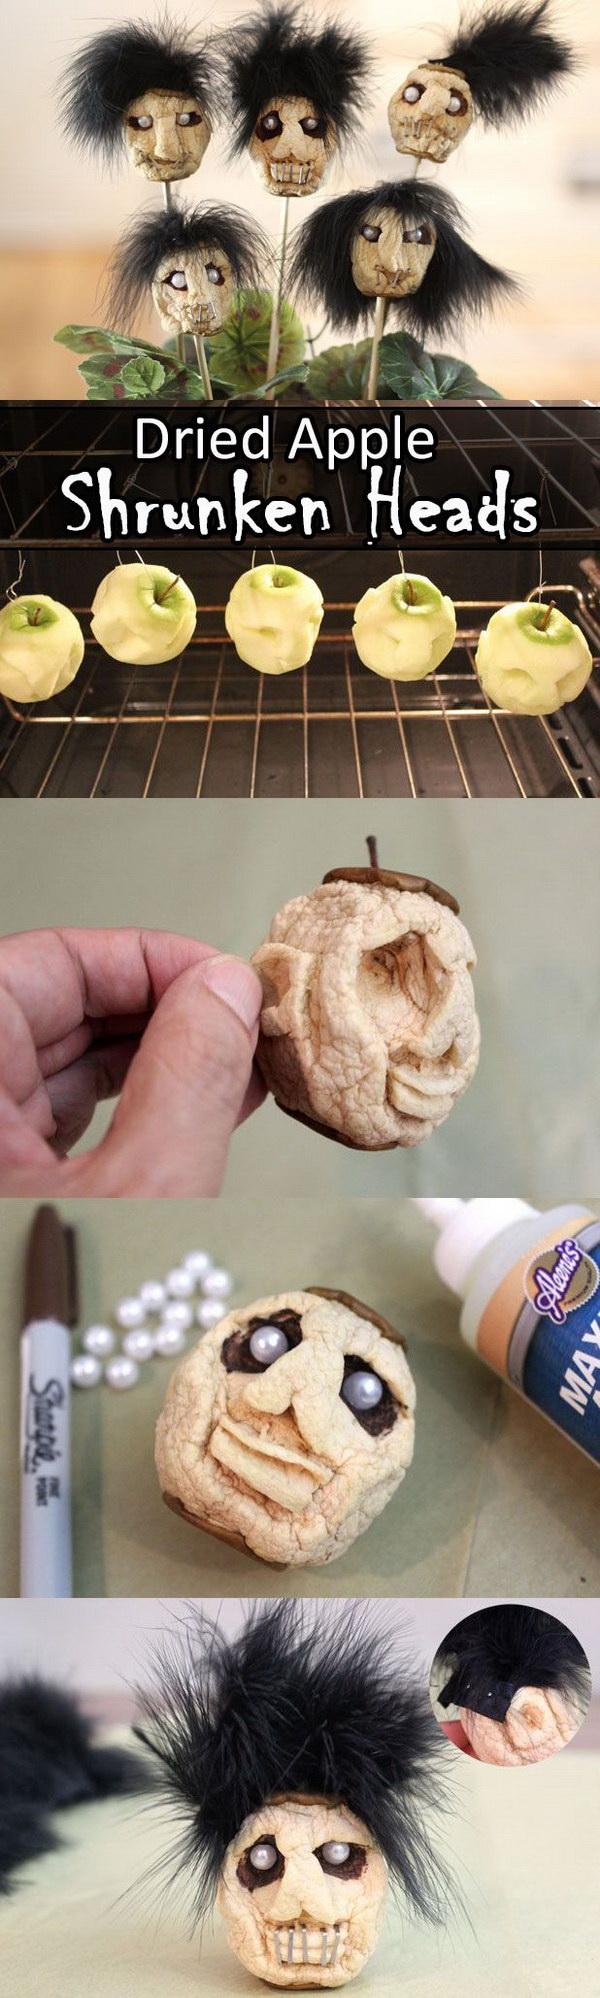 Dried Apple Shrunken Heads. DIY Halloween Craft with Dried Apples -Shrunken Heads for Halloween!